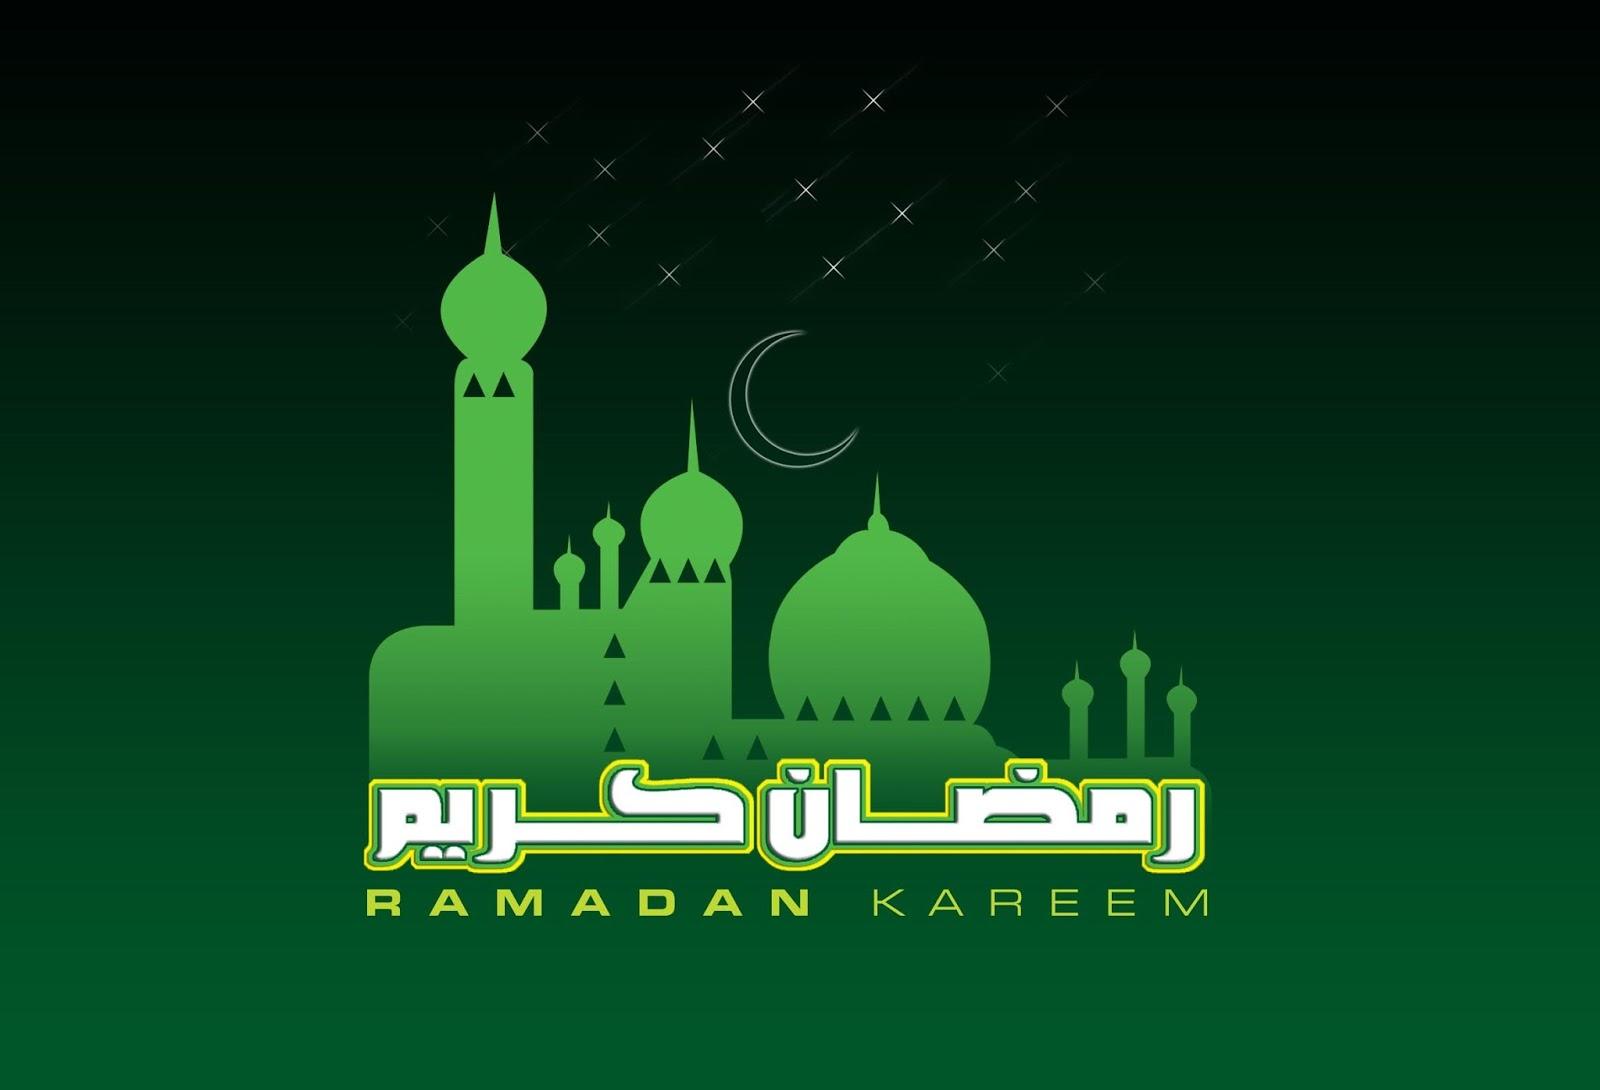 Wallpaper Cantik Ramadhan